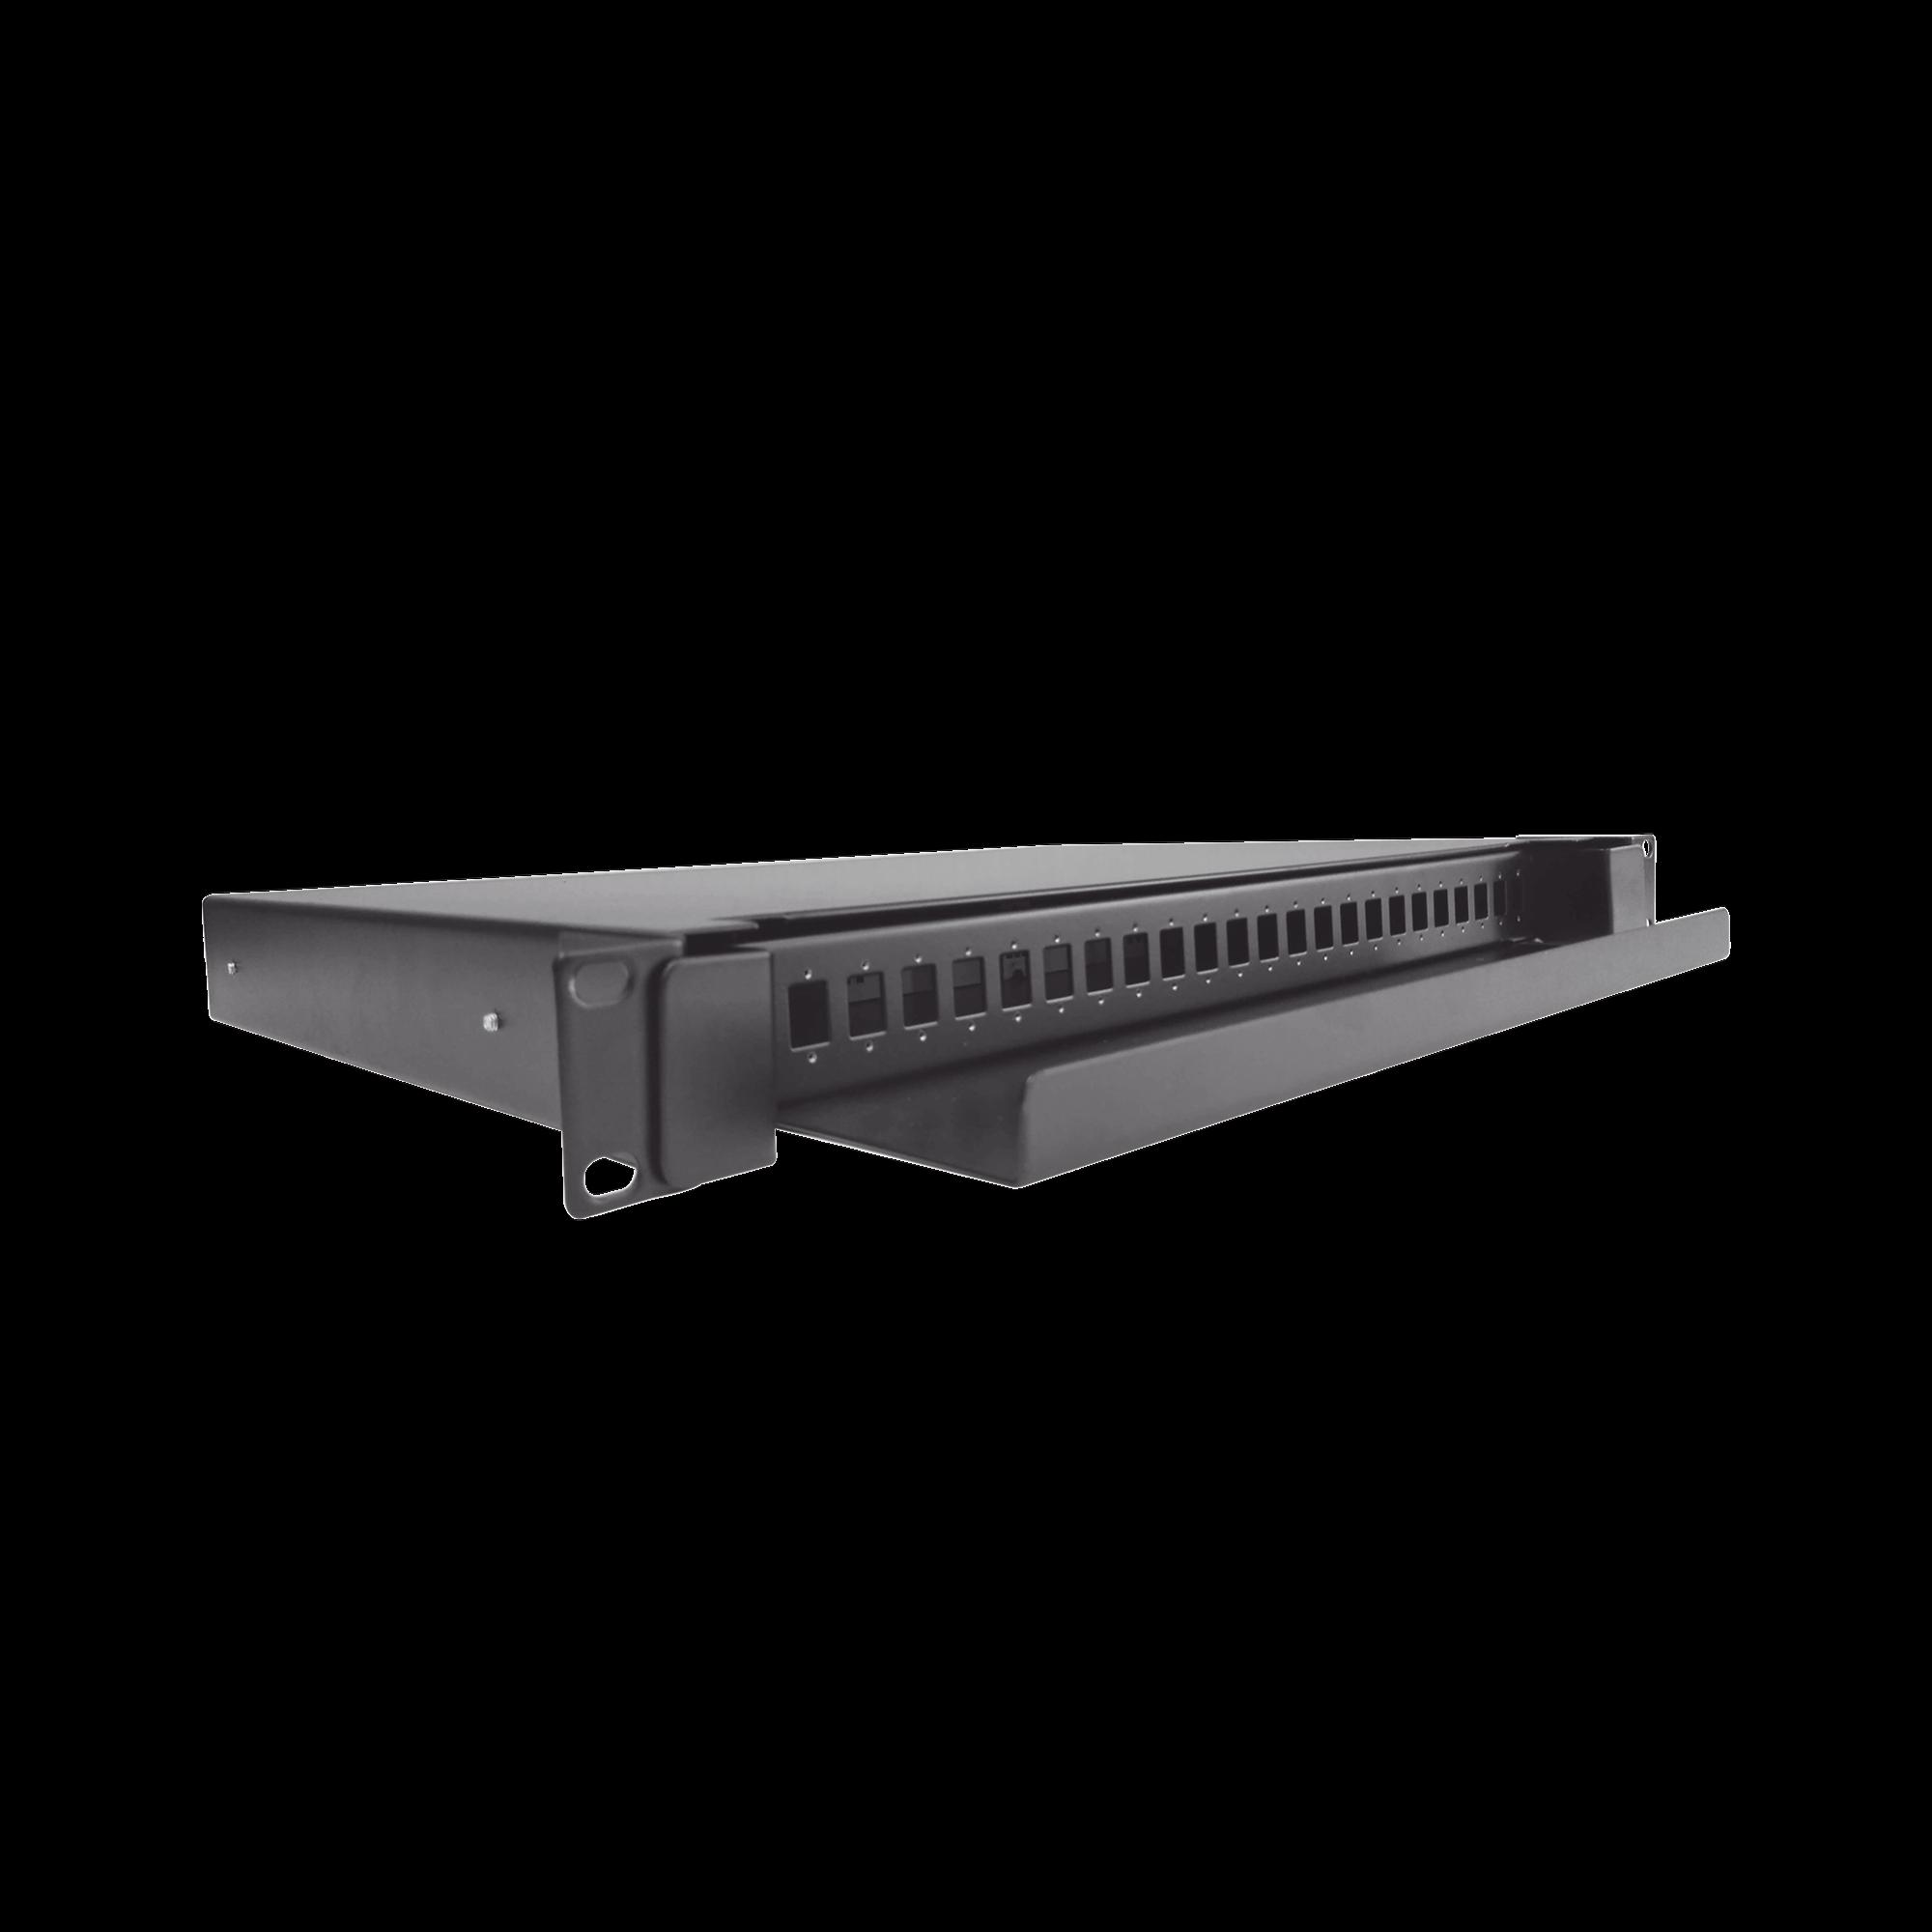 Distribuidor de Fibra óptica deslizable, vacío, 19in, acepta 24 adaptadores LC Duplex o LC Simplex o 24 SC Simplex, 1U